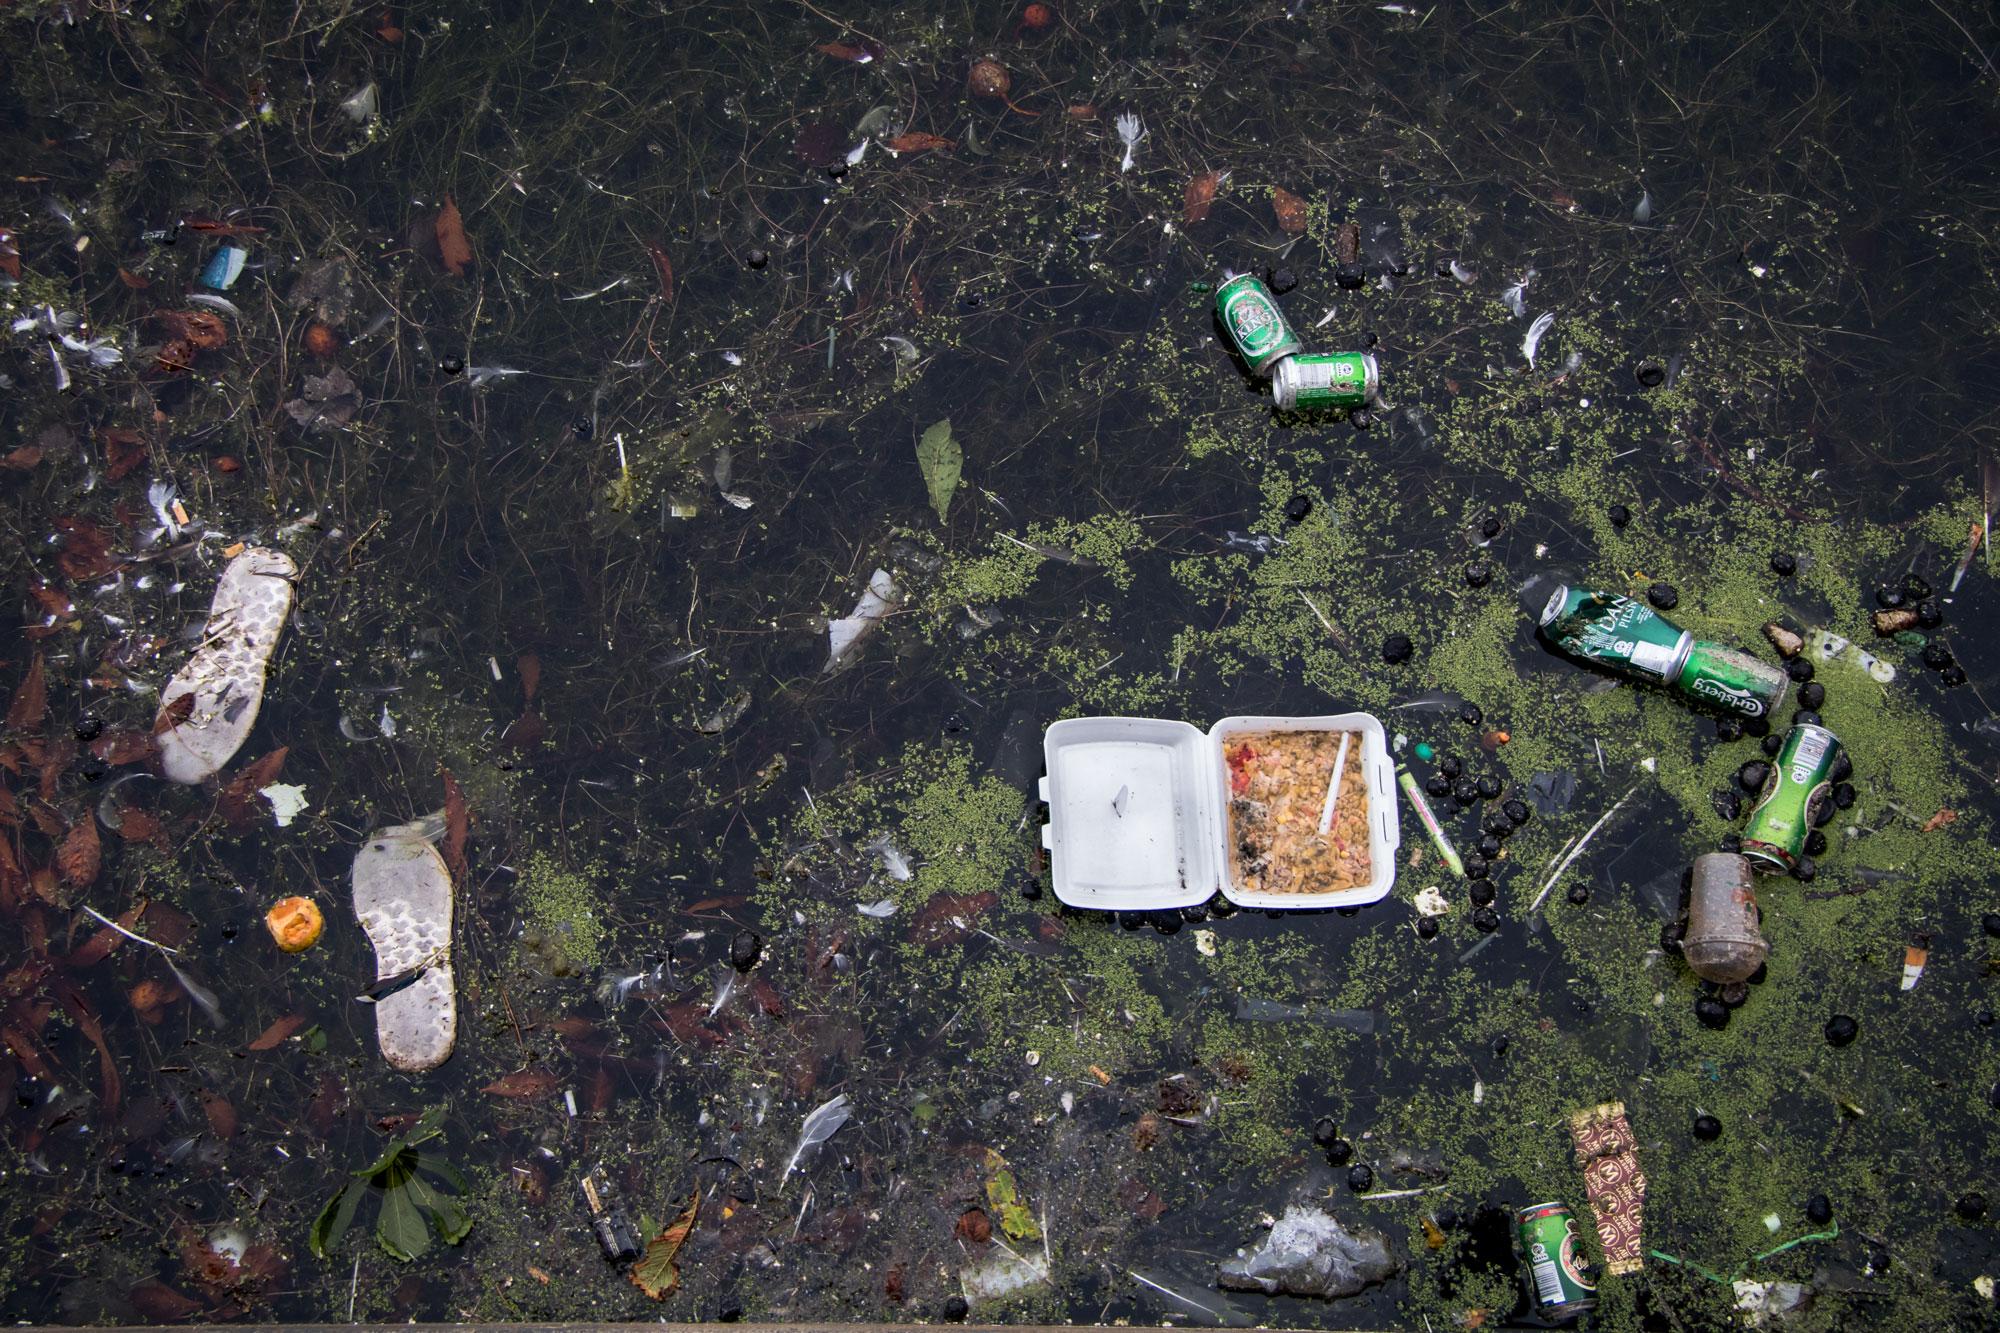 Plastik affald i naturen - styrefoam